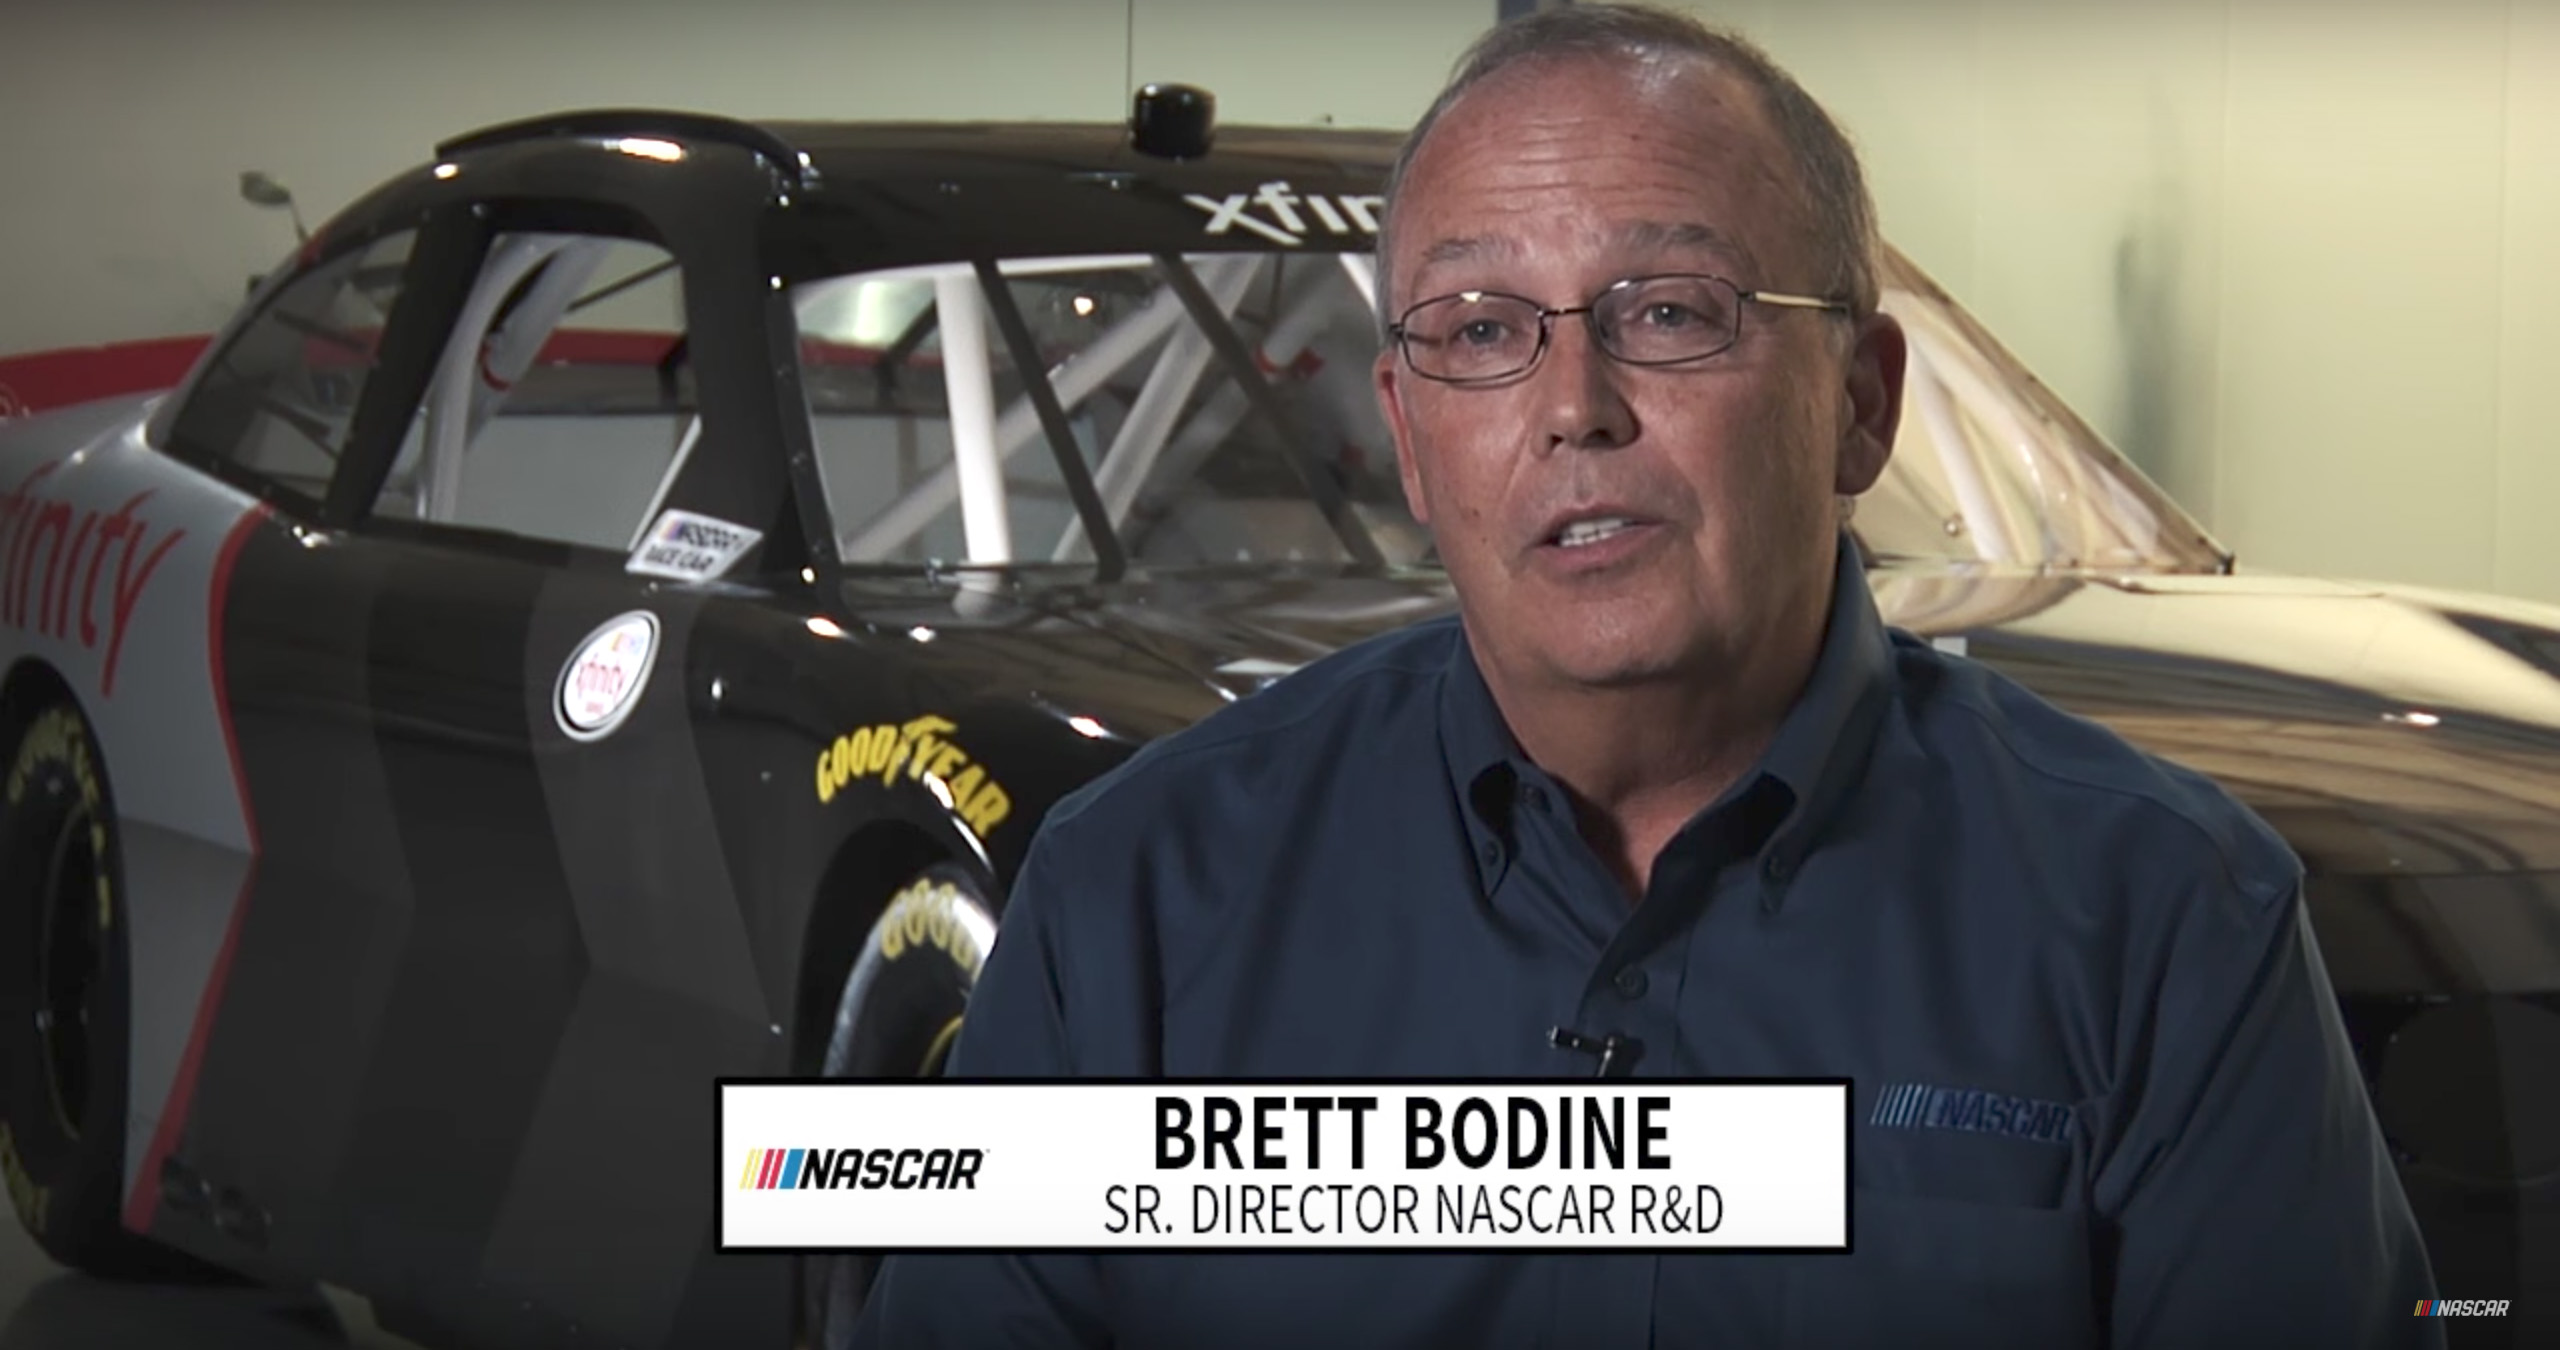 Brett Bodine Senior Director of NASCAR Research and Development